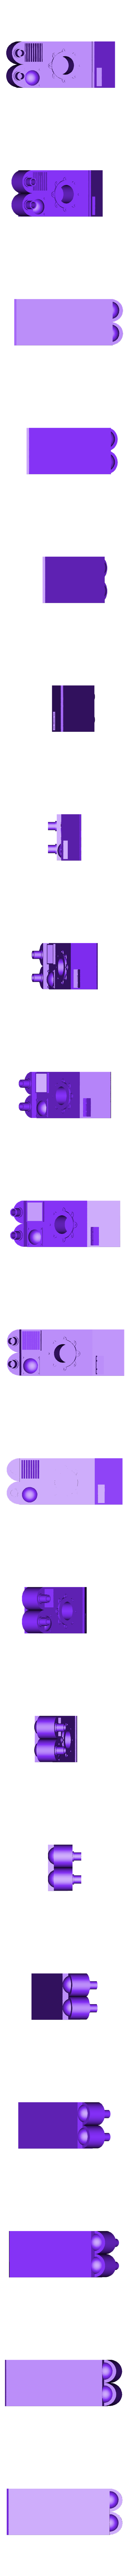 "Ork_Tank_hull.stl Télécharger fichier STL gratuit Ork / Orc Tank ""Bone Breaker"" 28mm wargames véhicule • Plan pour impression 3D, redstarkits"